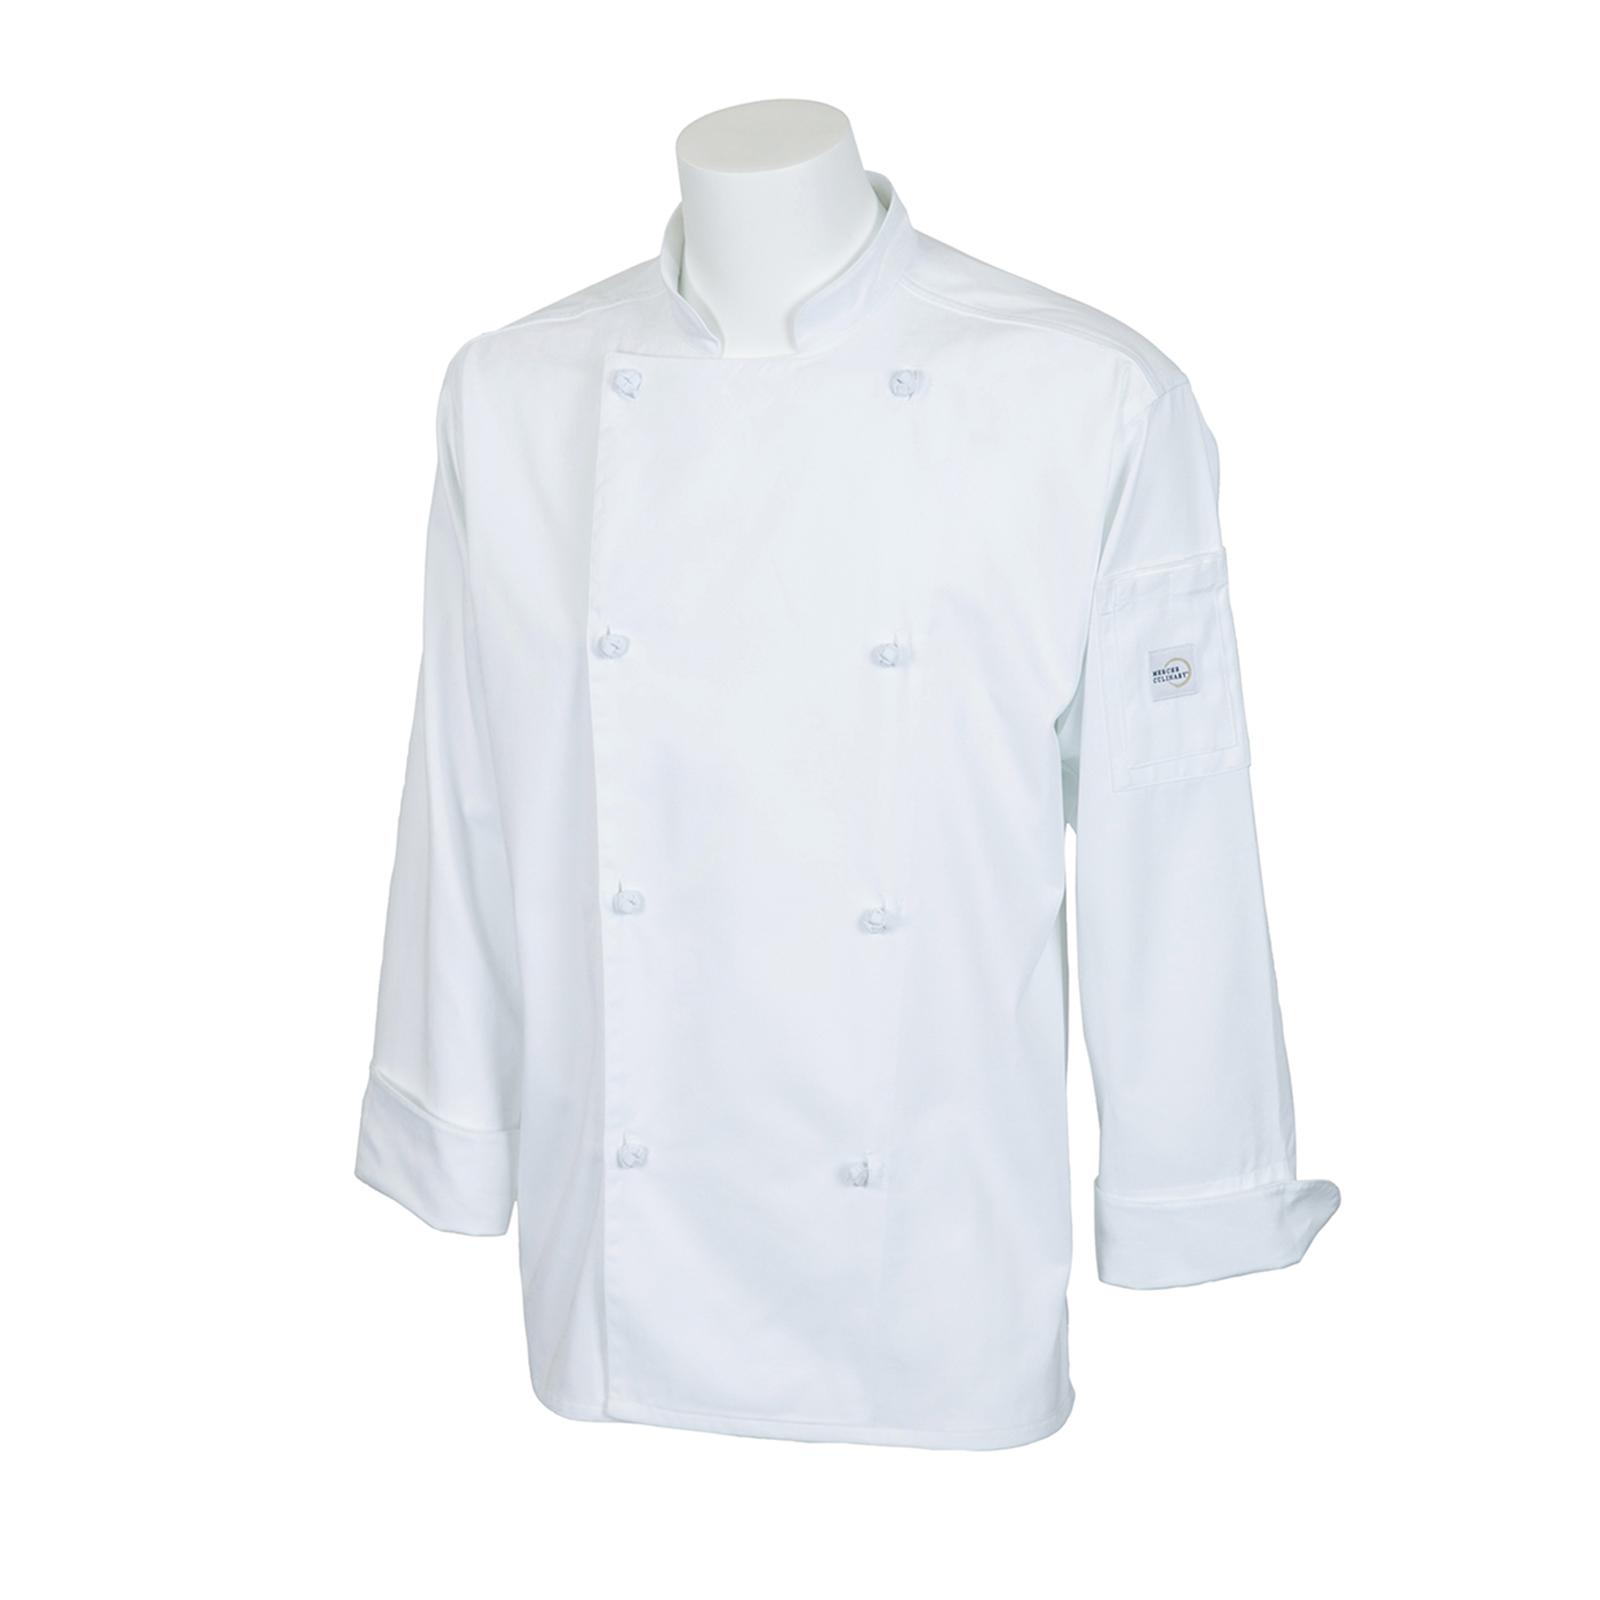 Mercer Culinary M61020WHXS chef's coat